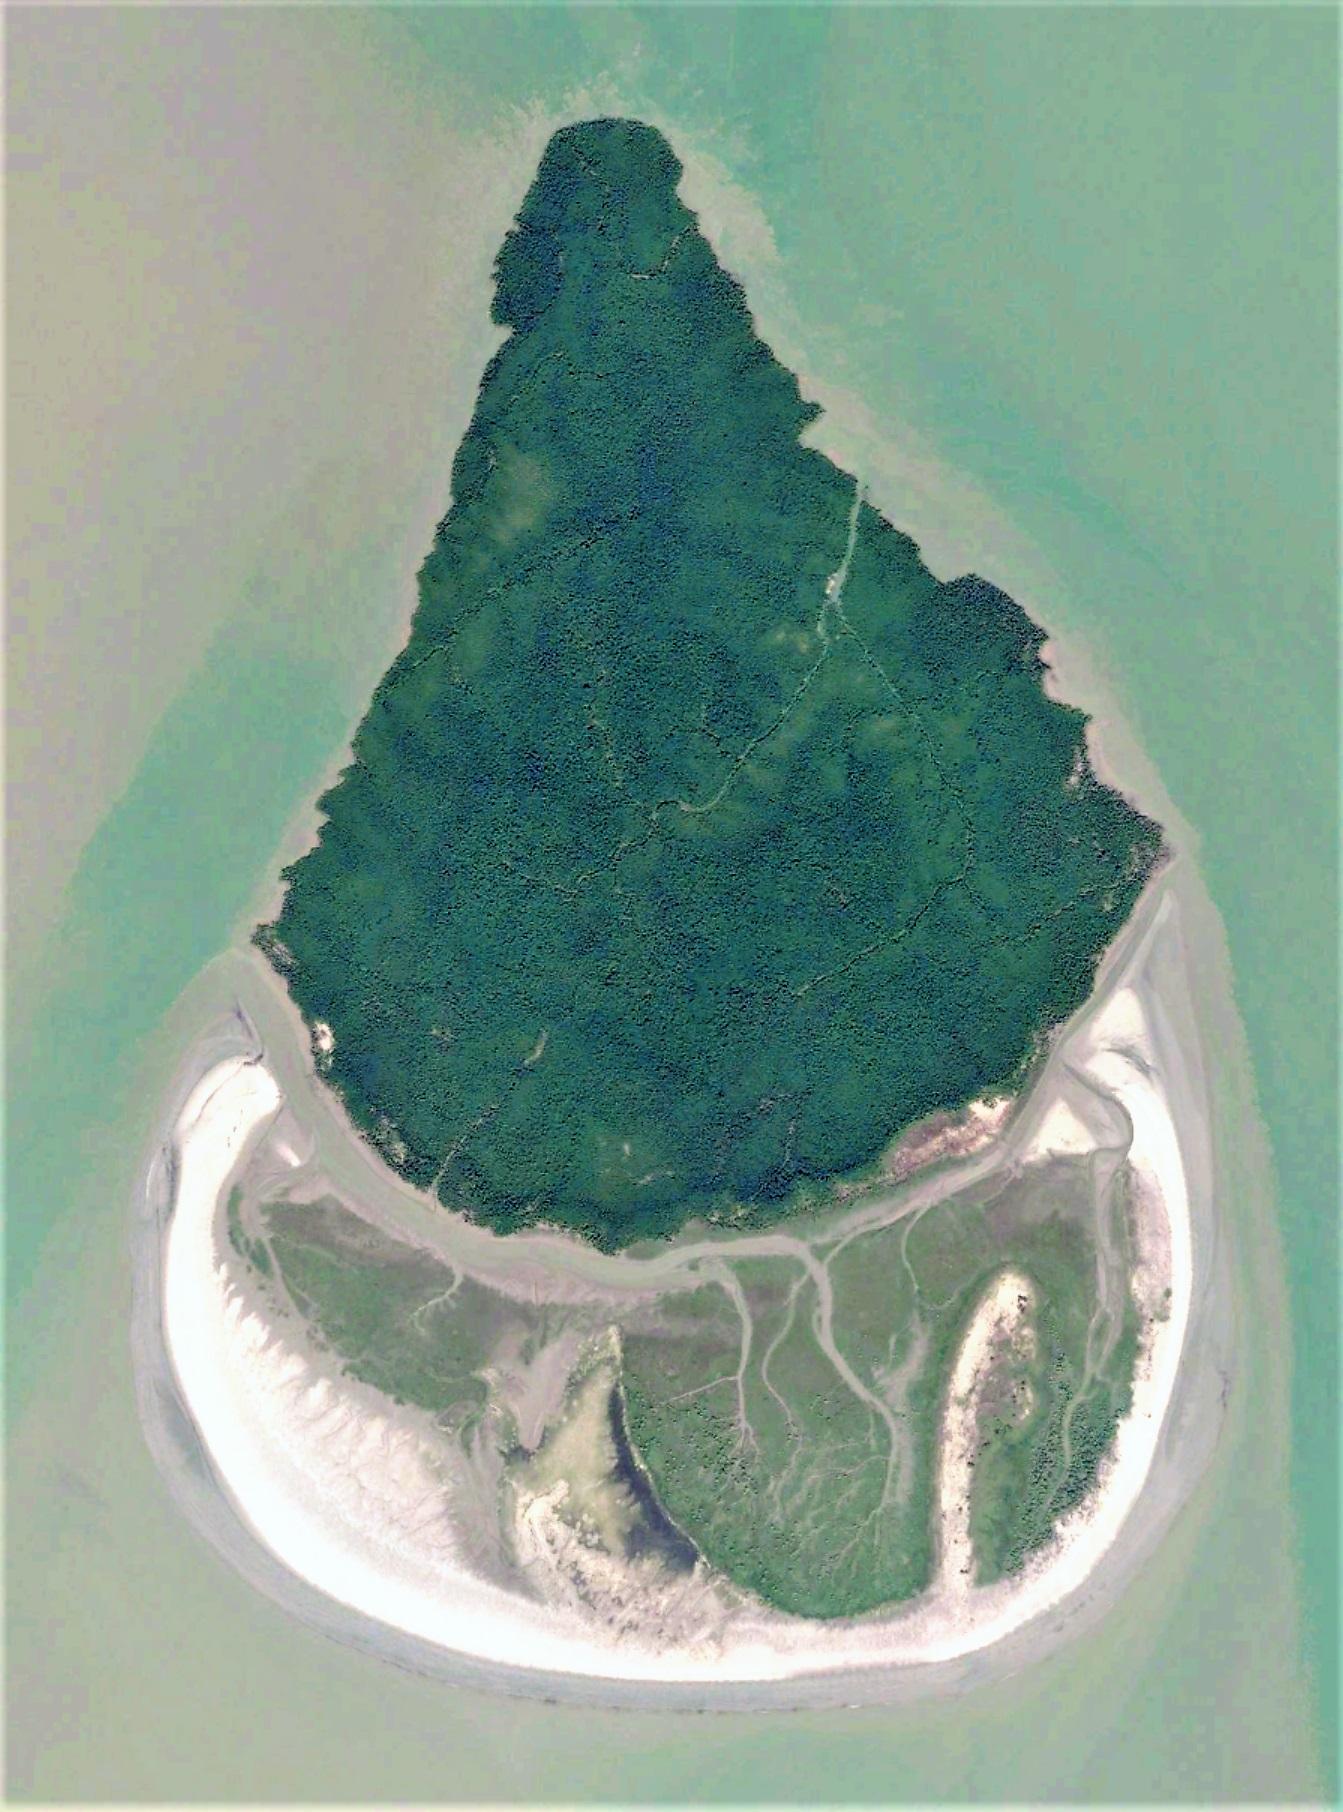 Putney island under formation process. Image width: 3 kilometers